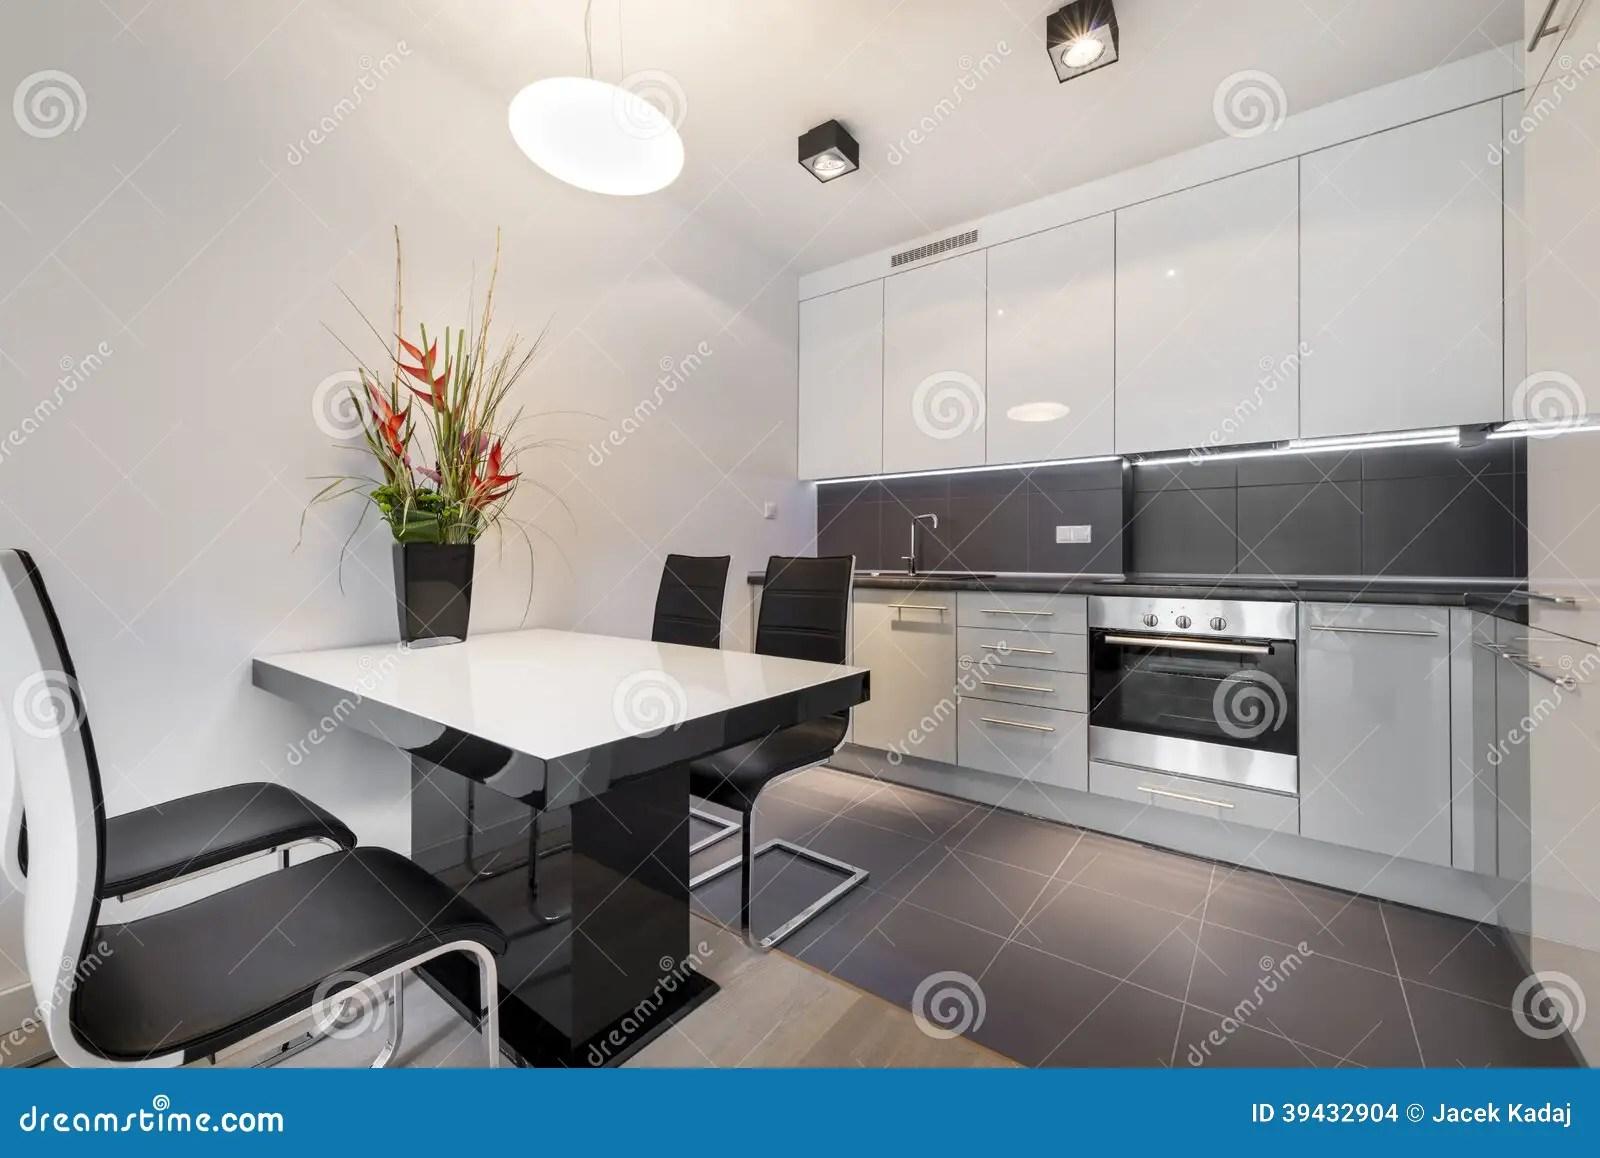 Piastrelle color grigio cotto toscana gres effetto cotto cemento